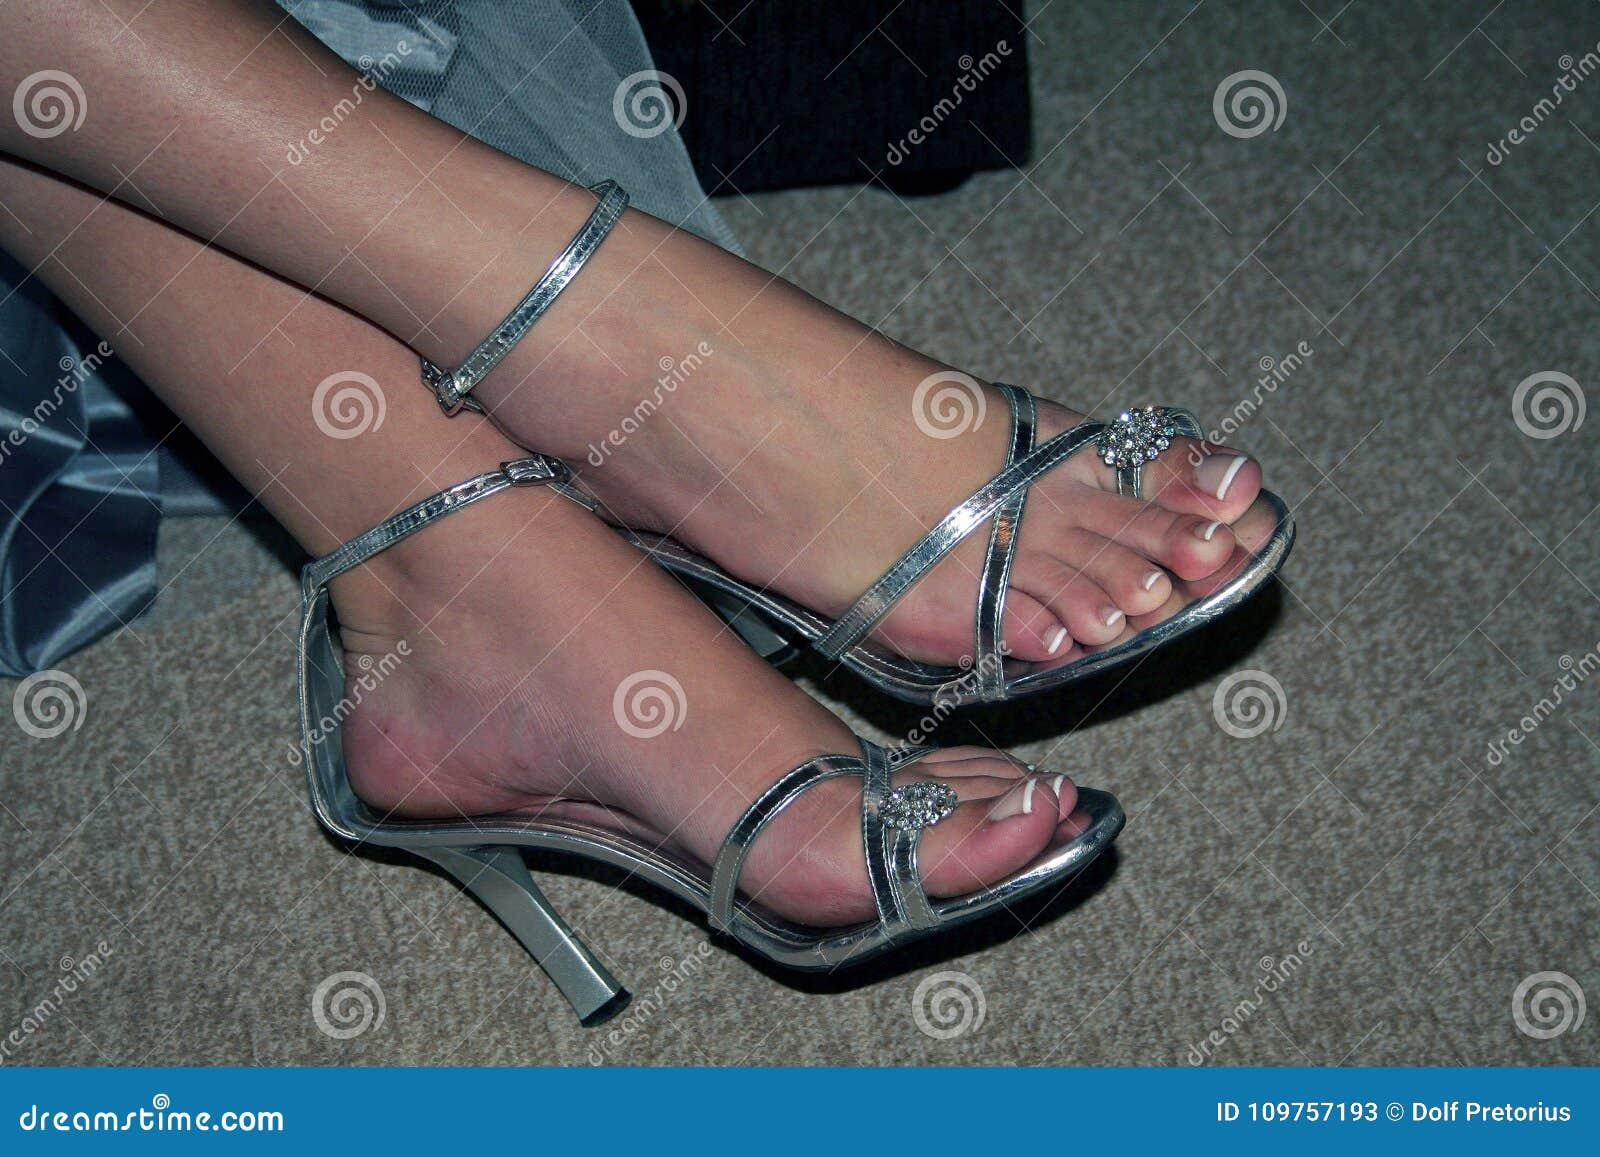 c7c6490abe0 Εικόνα SLR των ποδιών και των αστραγάλων γυναικών ` s στα φανταχτερά ασημένια  παπούτσια με τα υψηλά τακούνια Αστράγαλοι που διασχίζονται δεξιά πέρα από  το ...